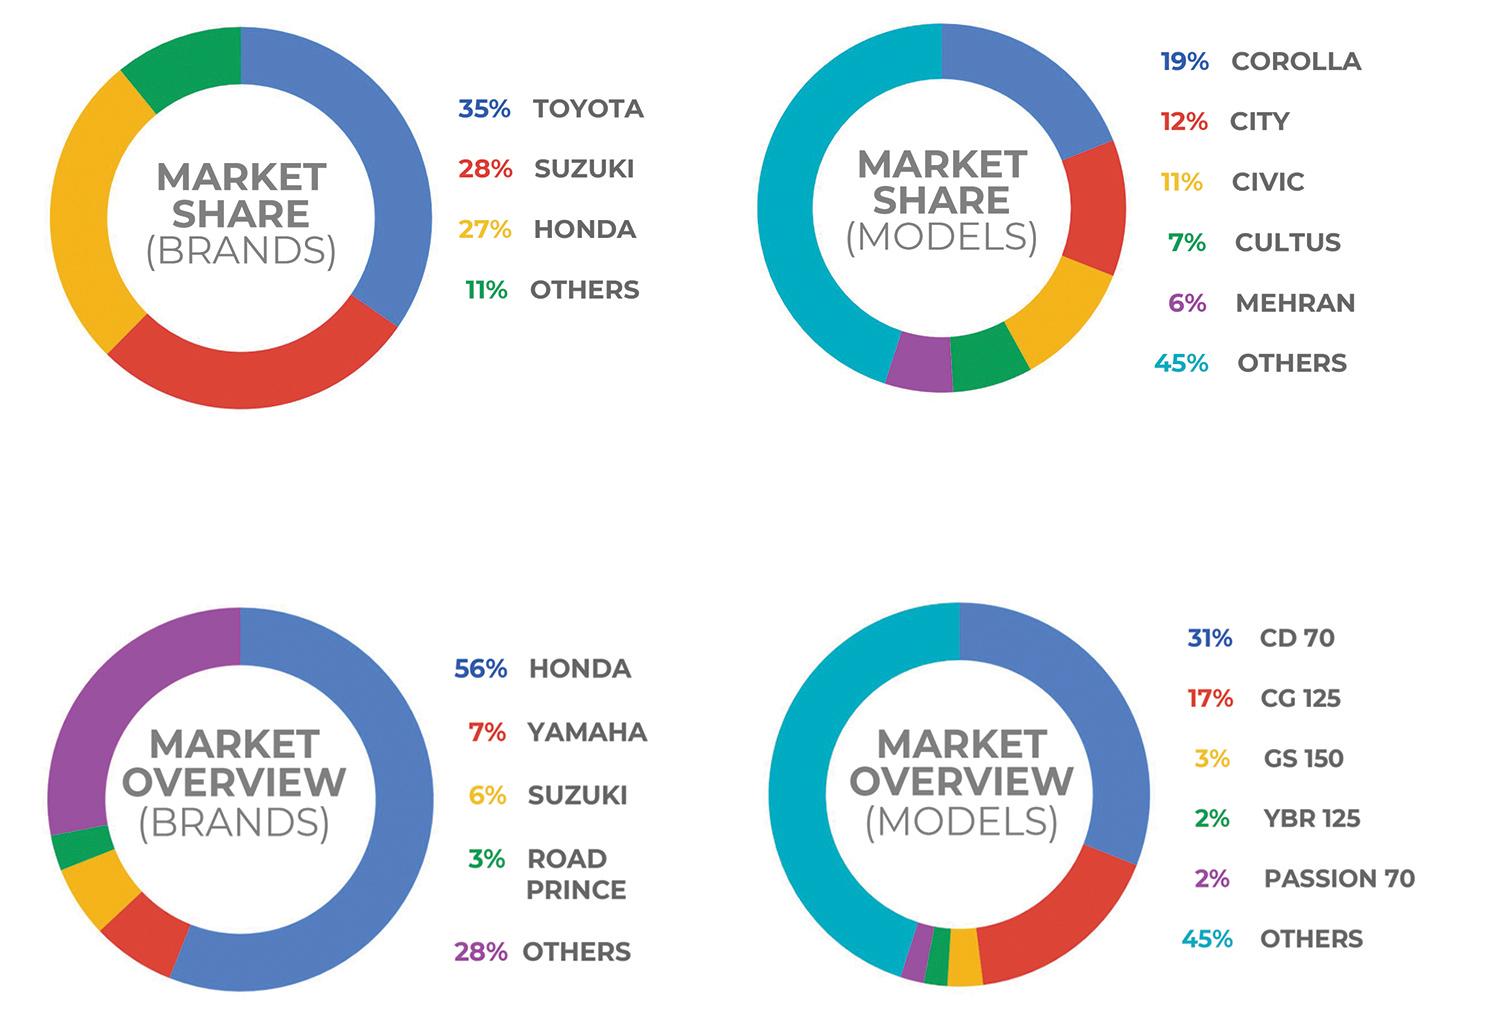 PakWheels Automobile Industry Survey 2017: Honda Civic and